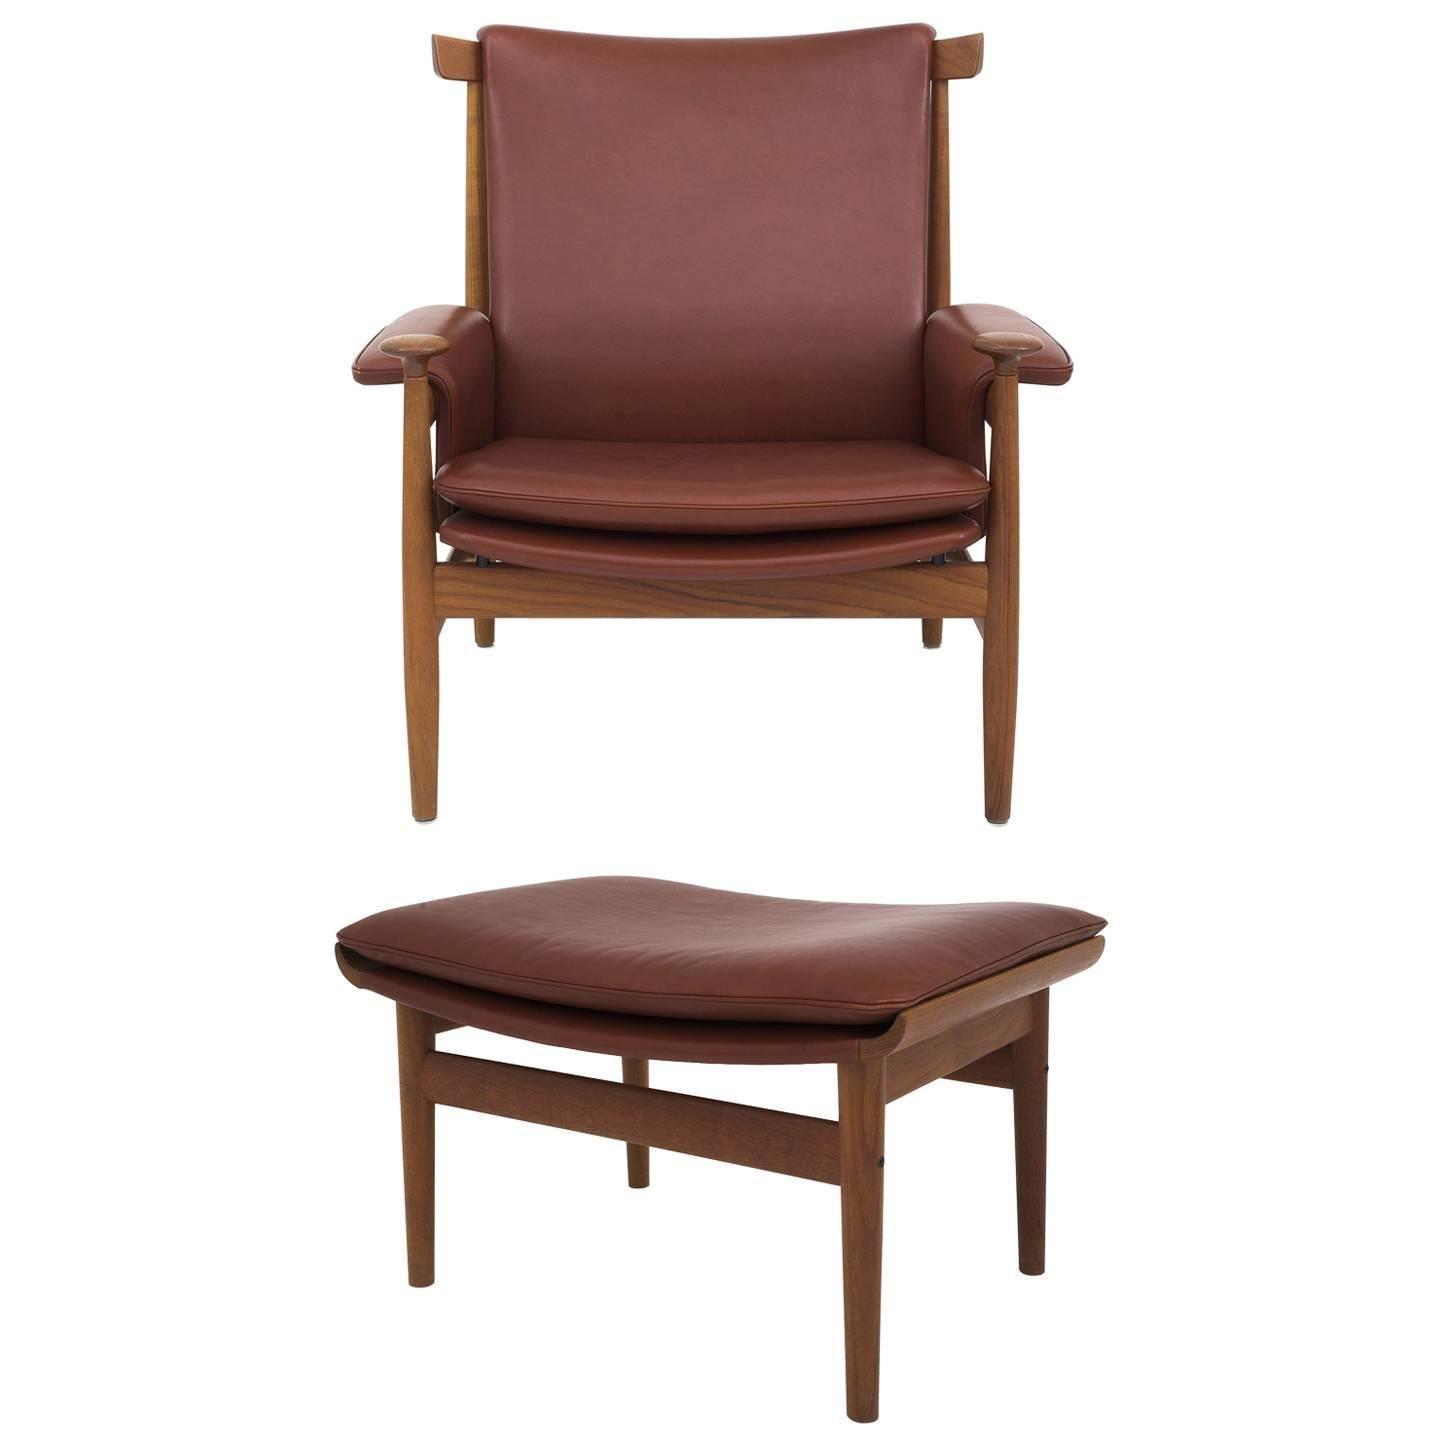 finn juhl bwana chair and stool in teak finn juhl pinterest